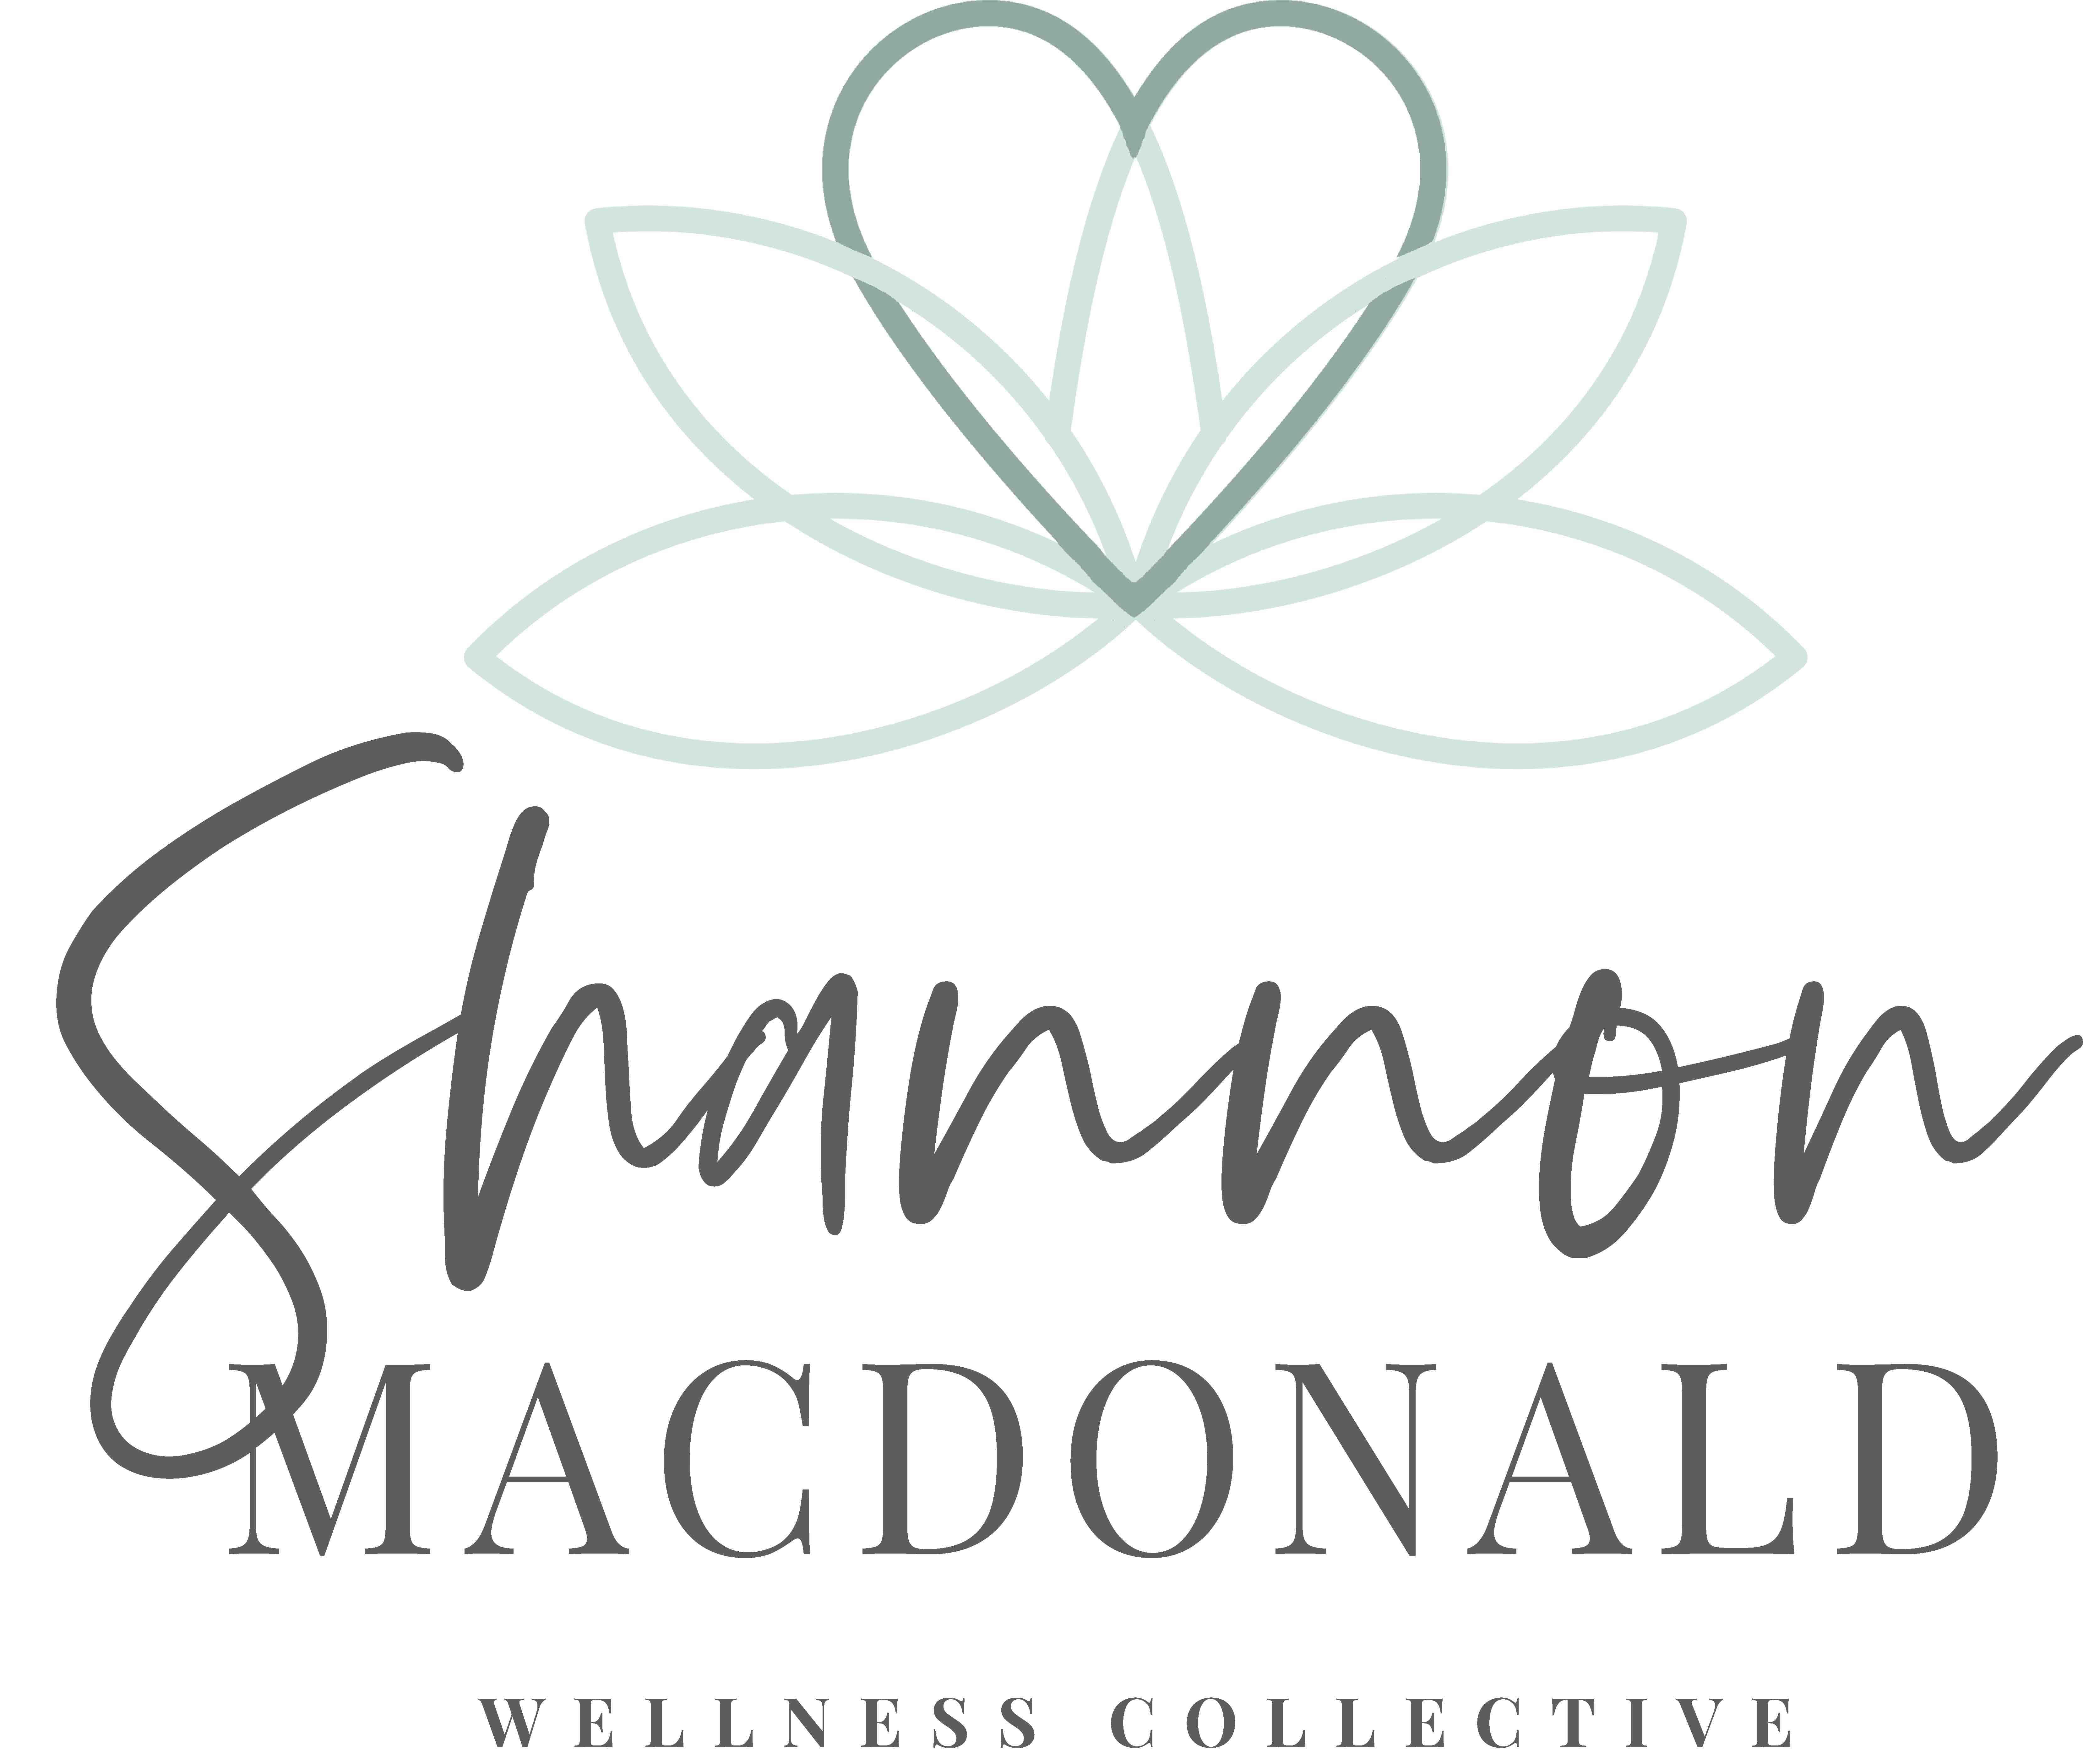 ShannonMacDonald-Wellness Collective.jpg